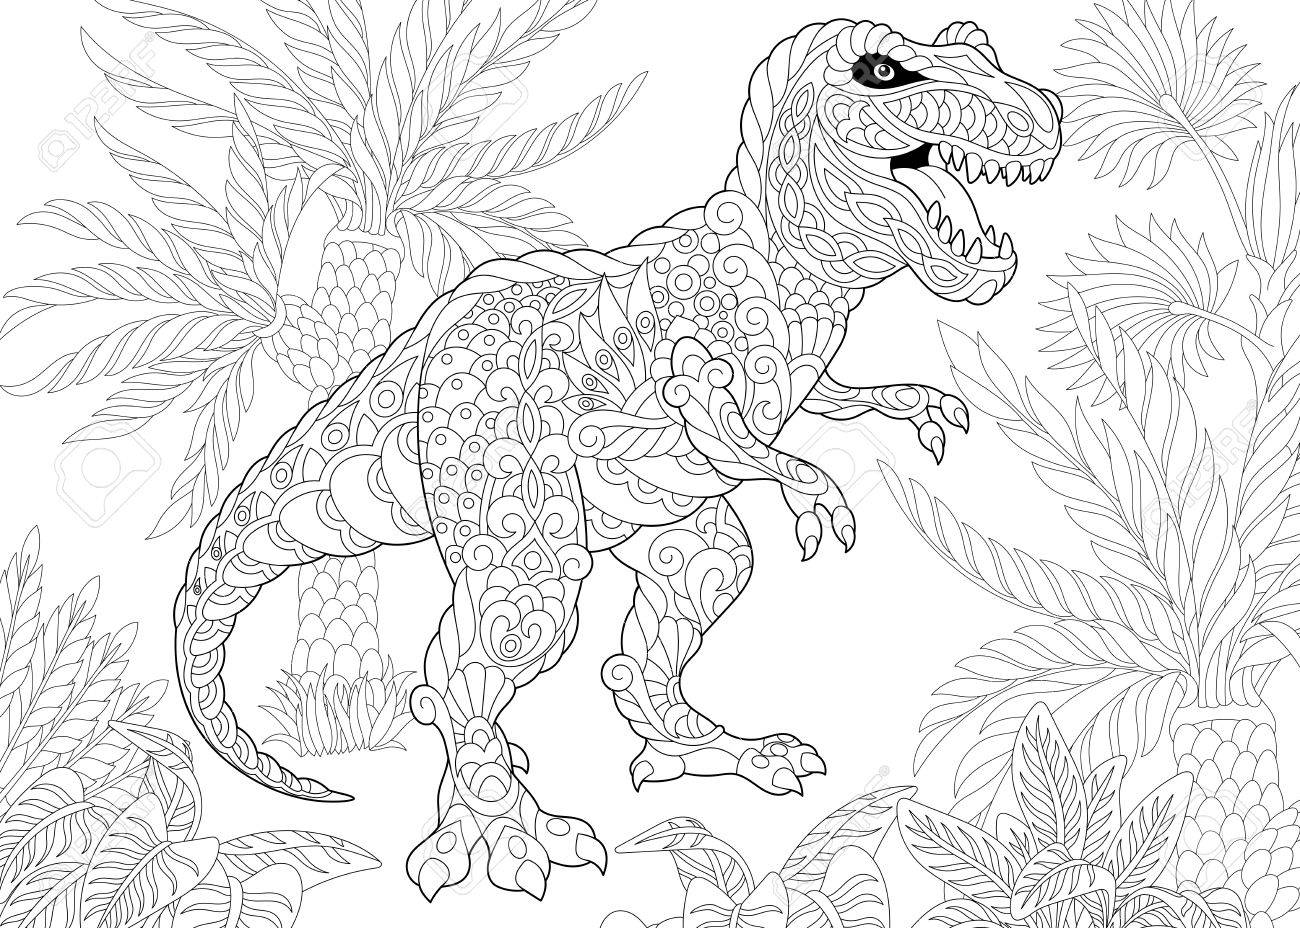 1300x928 Stylized Tyrannosaurus (T Rex) Dinosaur Of The Late Cretaceous